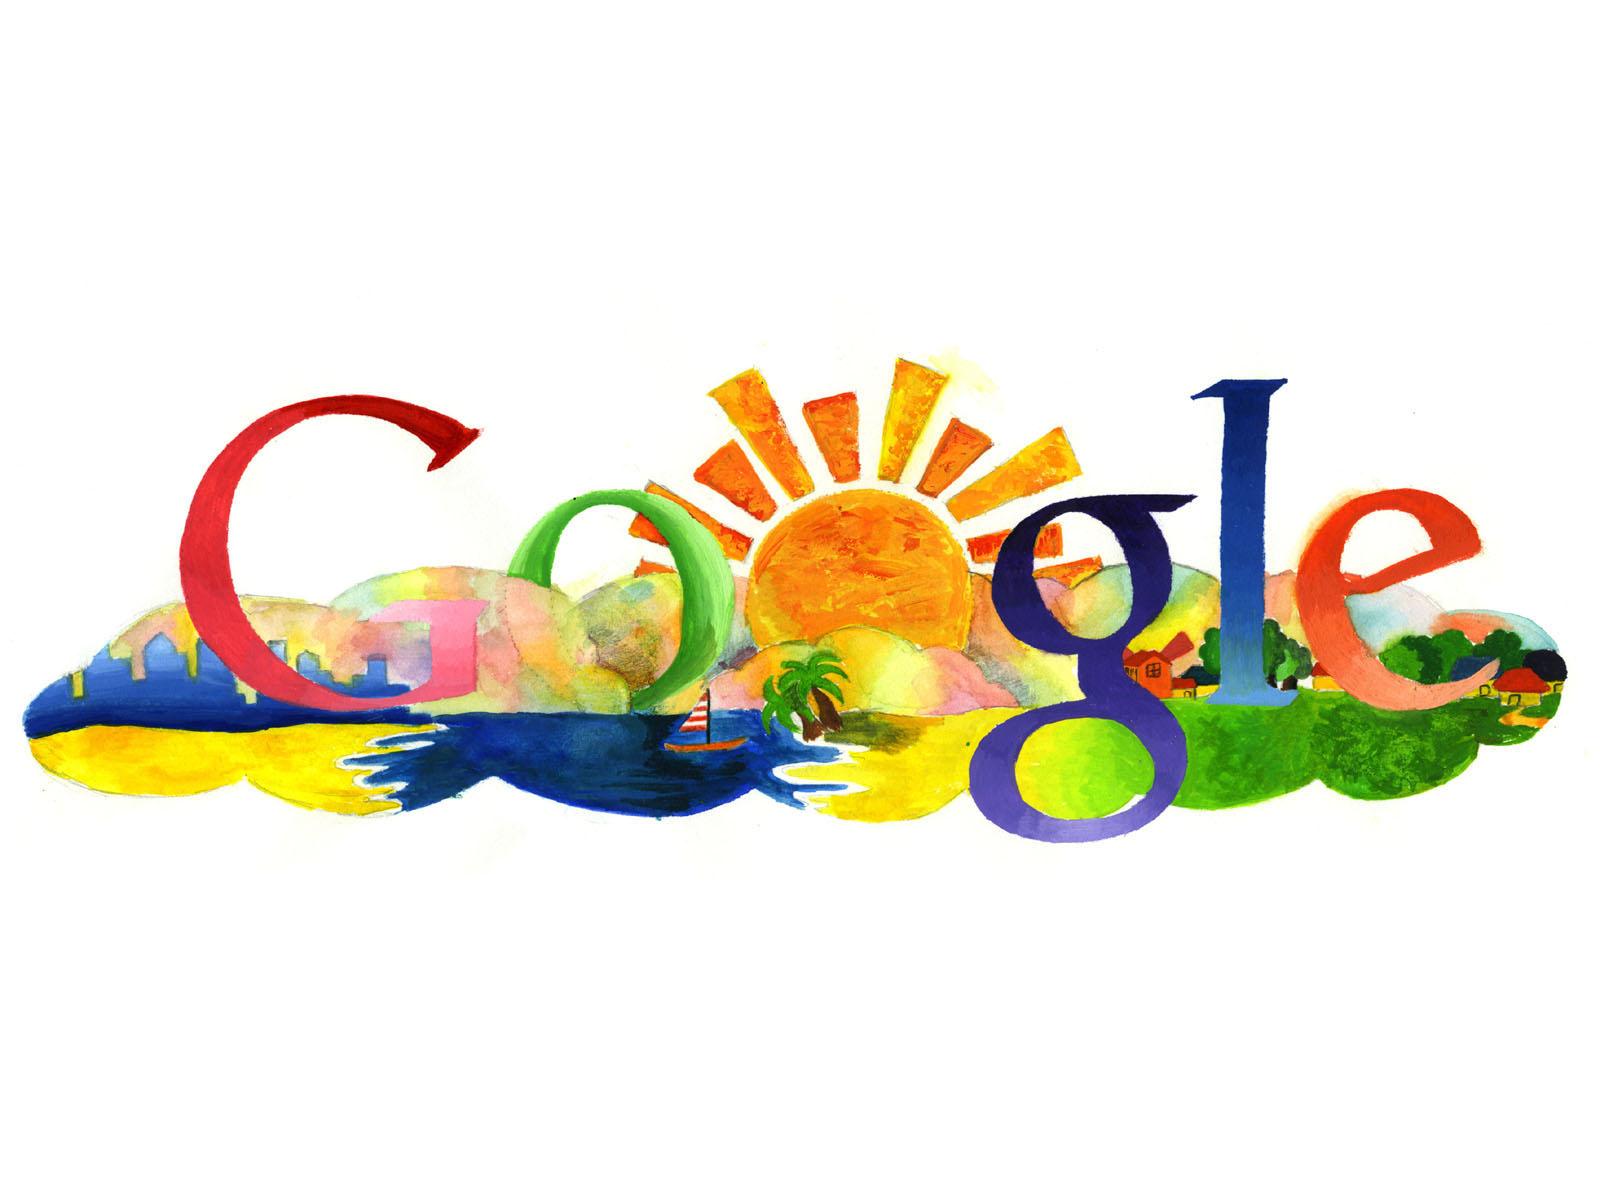 wallpapers Google Wallpapers 1600x1200